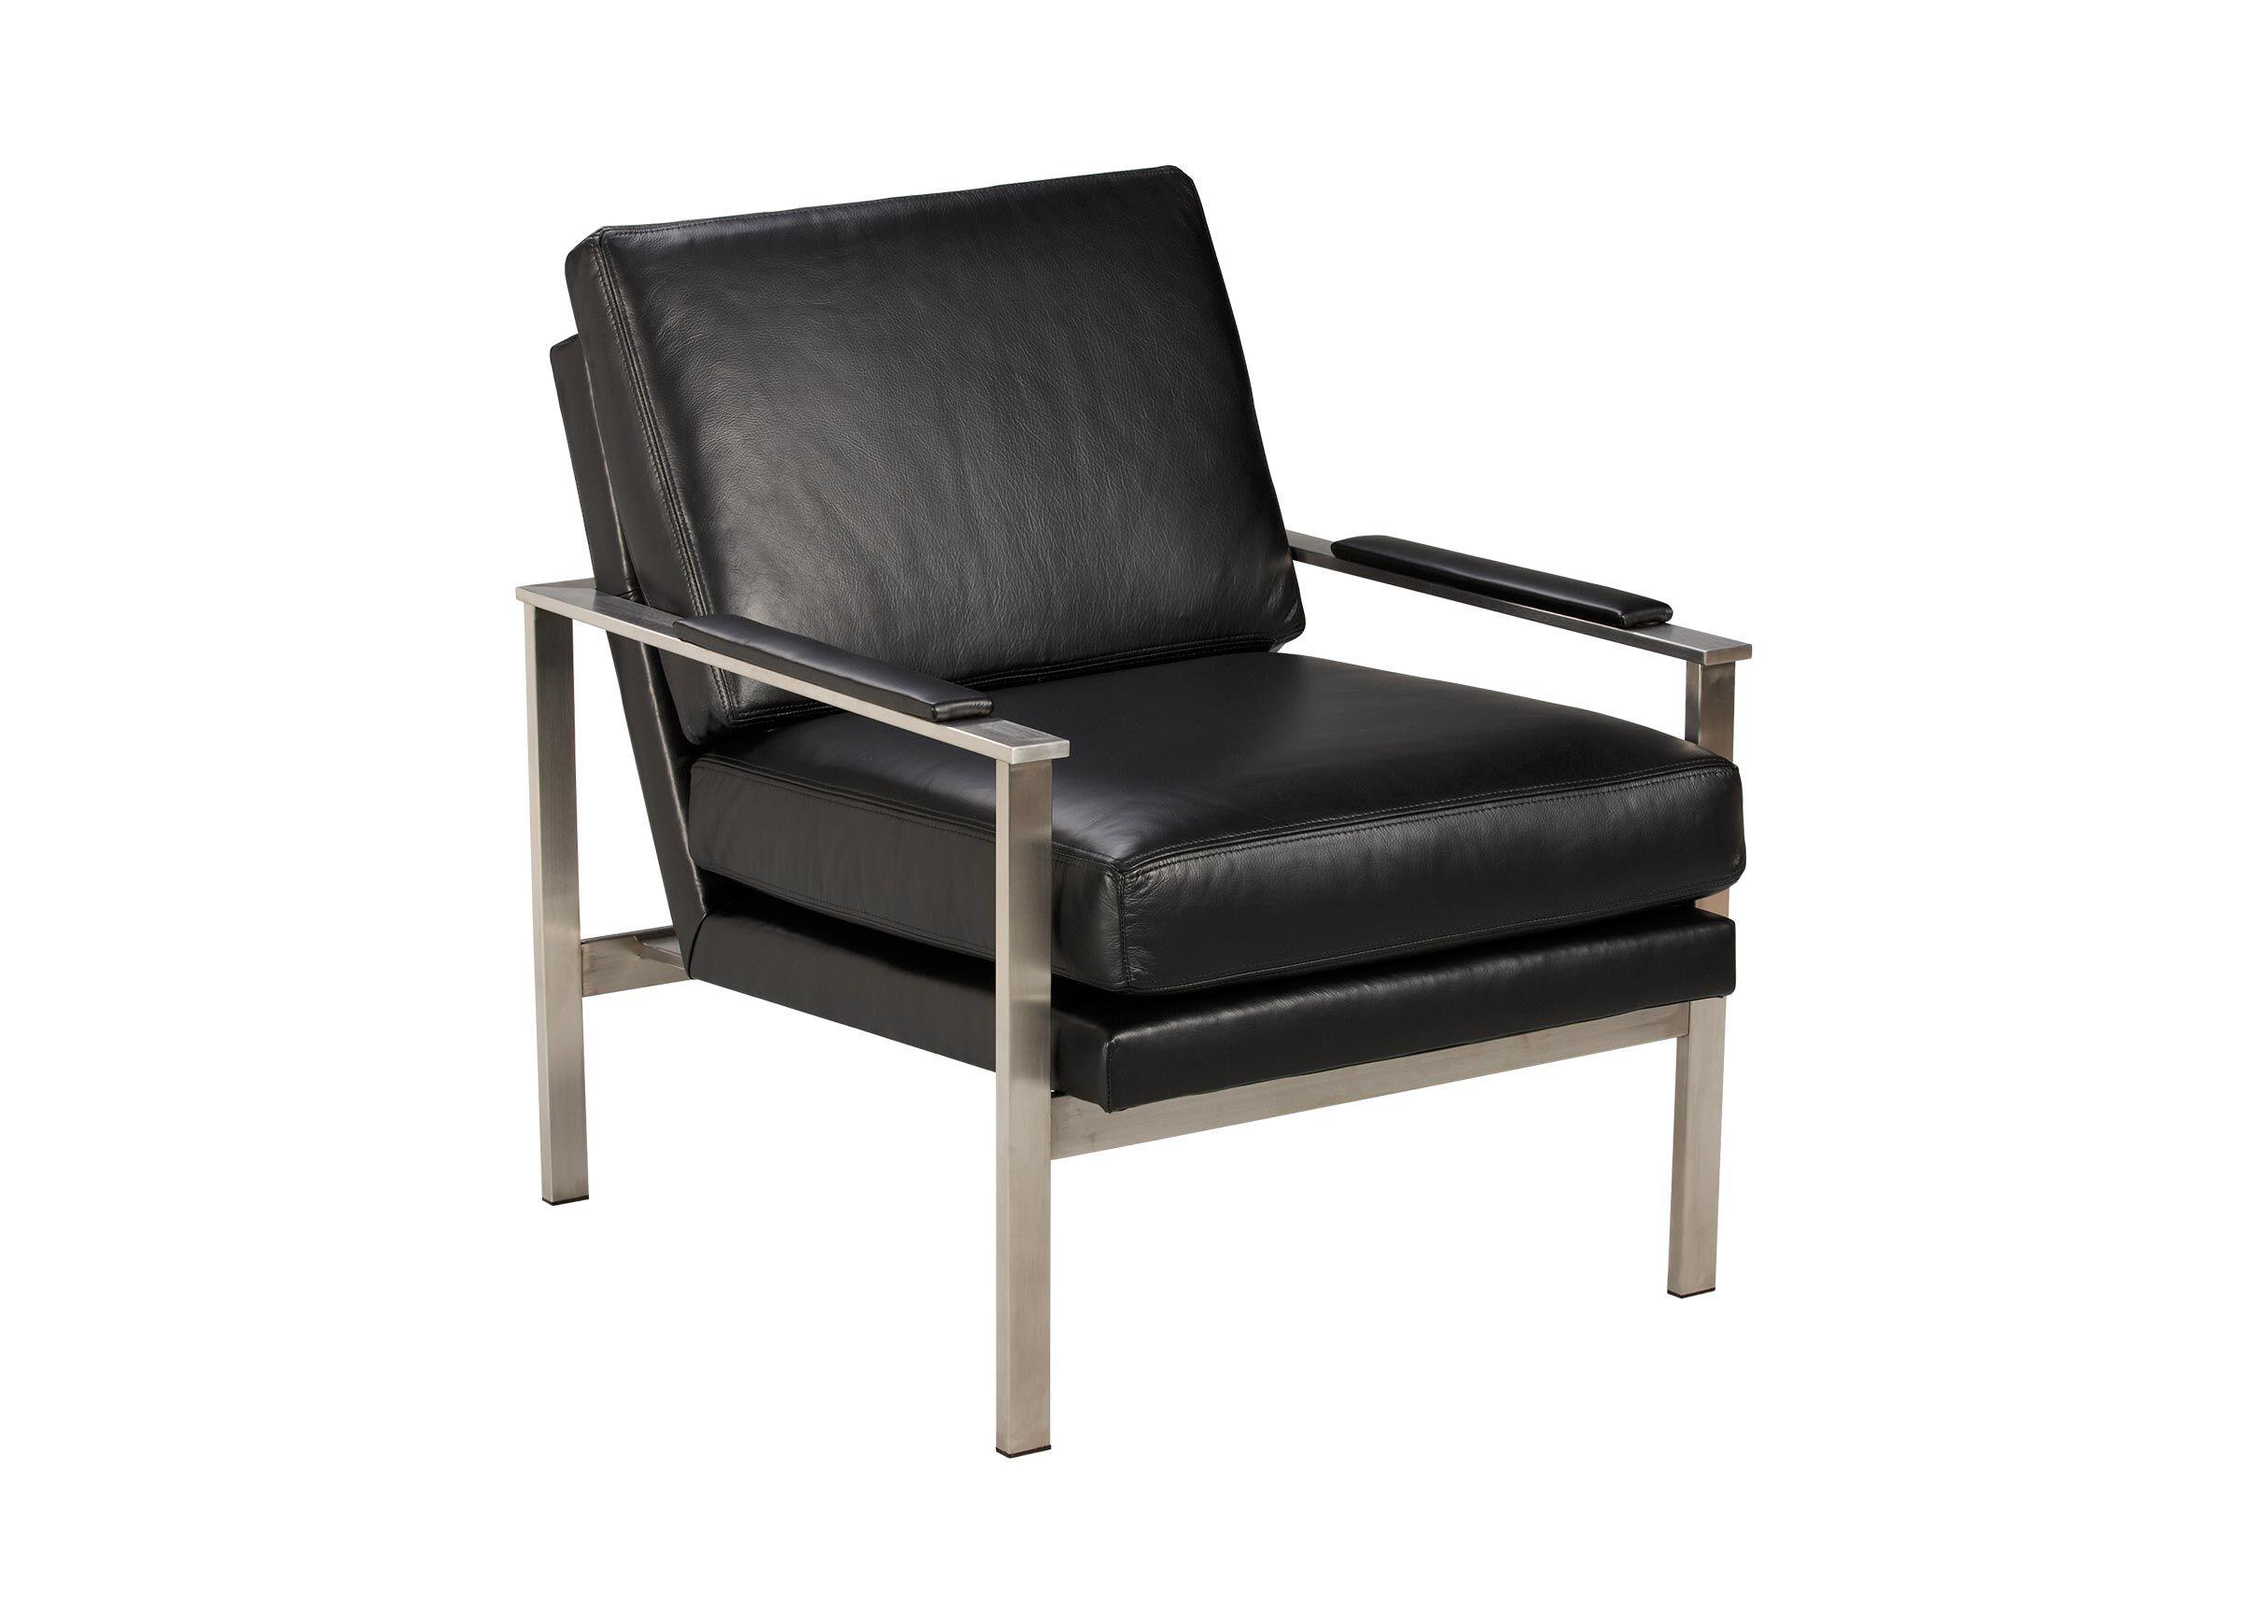 ethan allen leather chair cheetah print jericho chairs chaises null